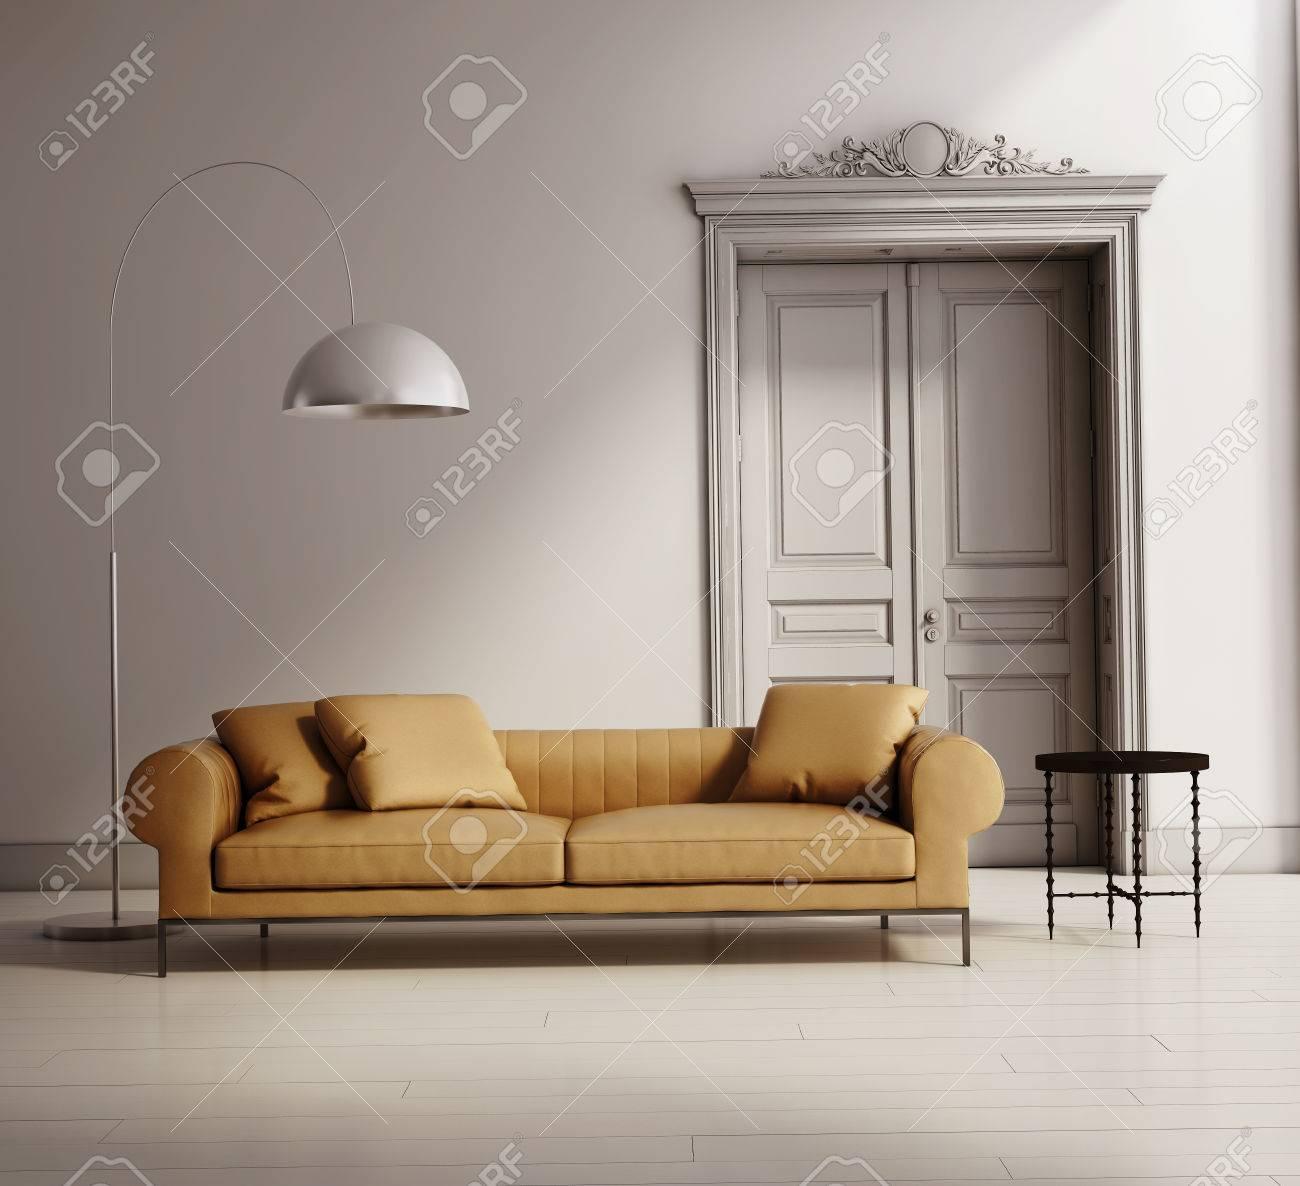 Contemporary Classic Living Room, Beige Leather Sofa, Wood Floor ...